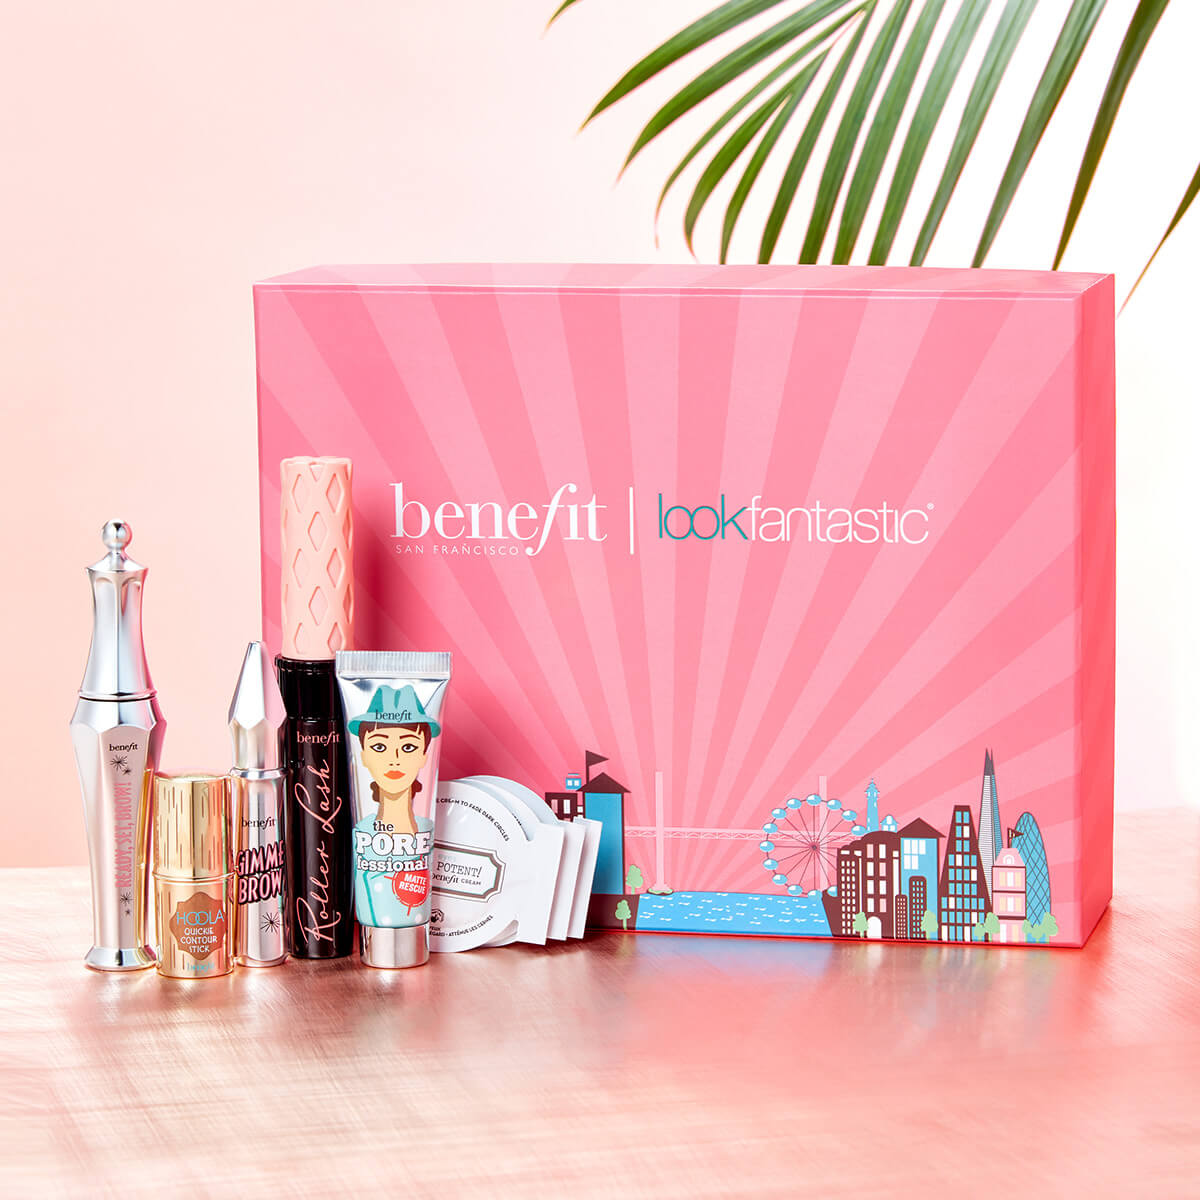 Lookfantastic X Benefit Limited Edition Beauty Box Free Shipping